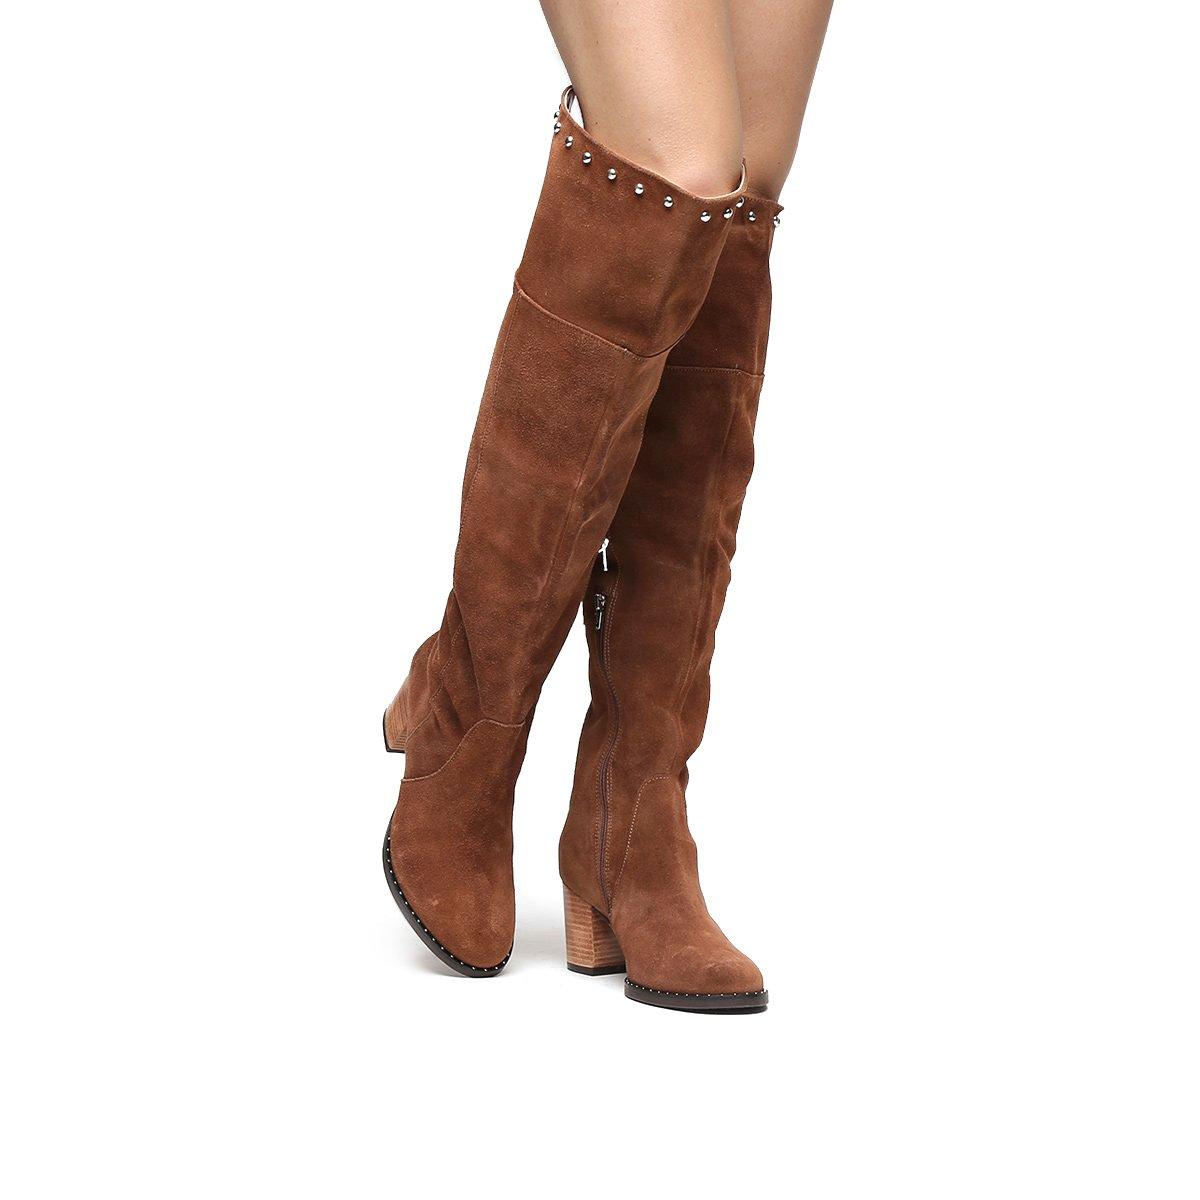 eb0b8c369 Bota Couro Shoestock Over the Knee Vira Cravos Feminina. undefined